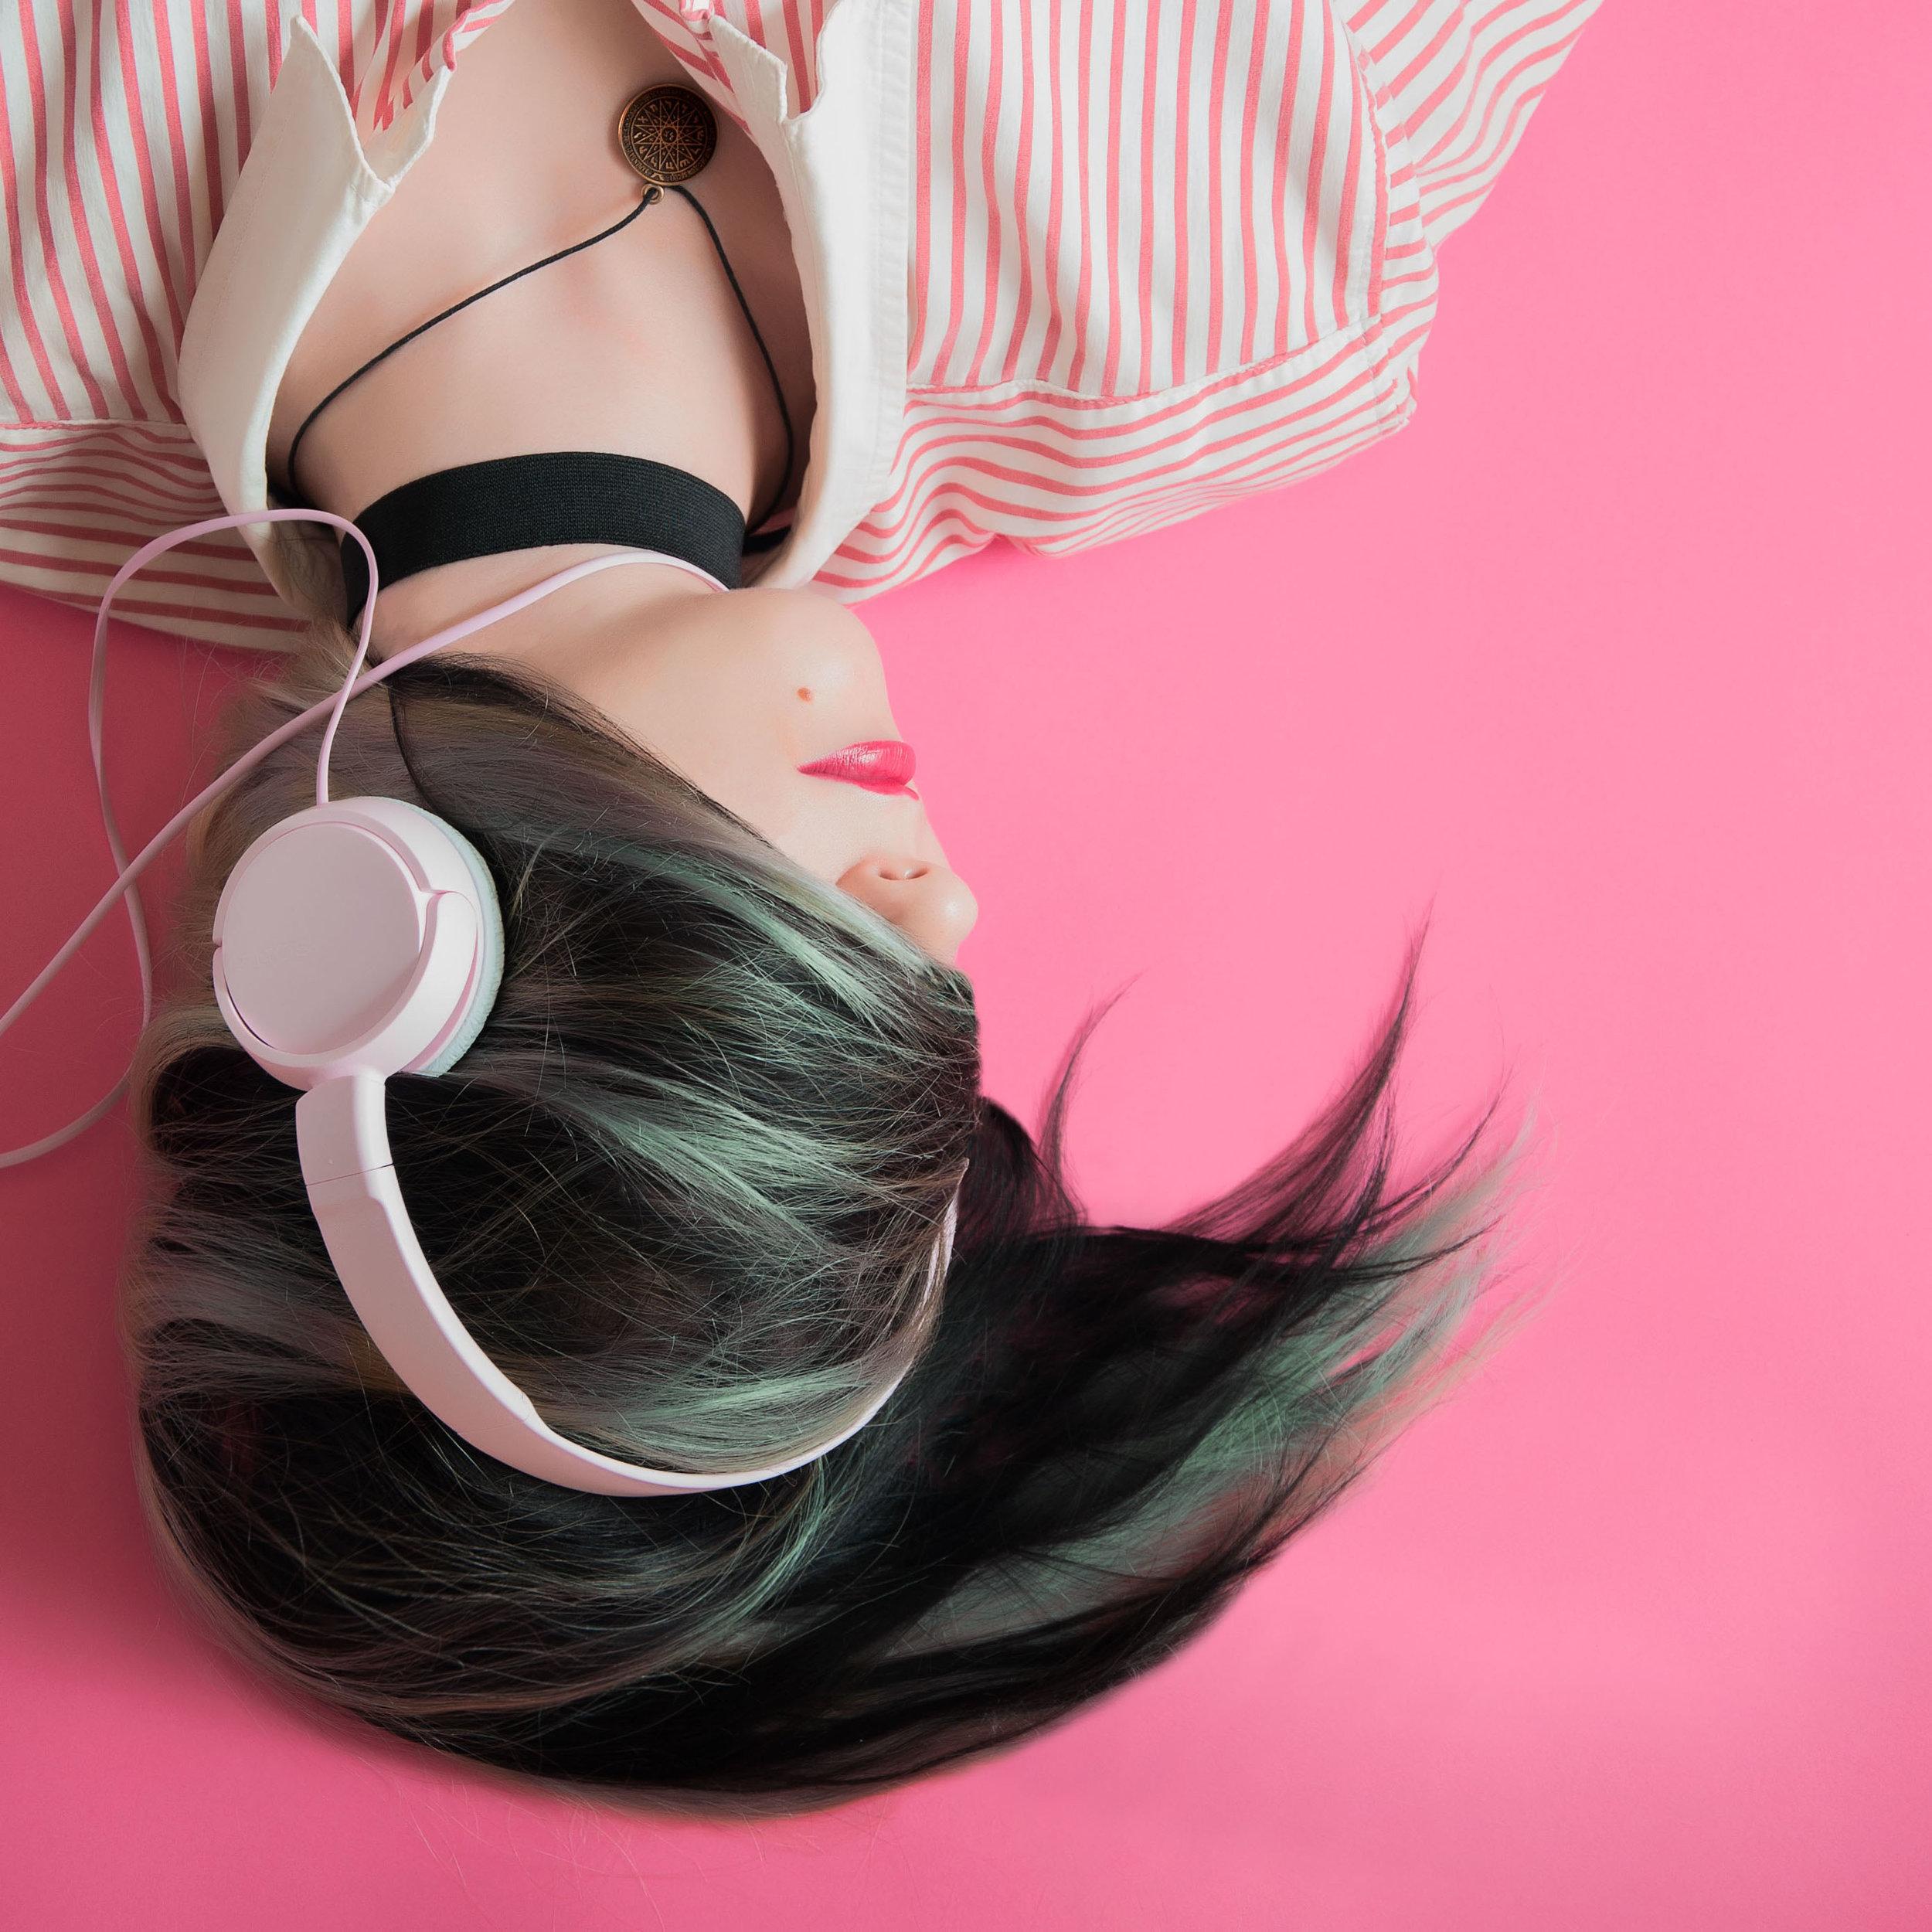 Girl with headphones alice moore.jpg